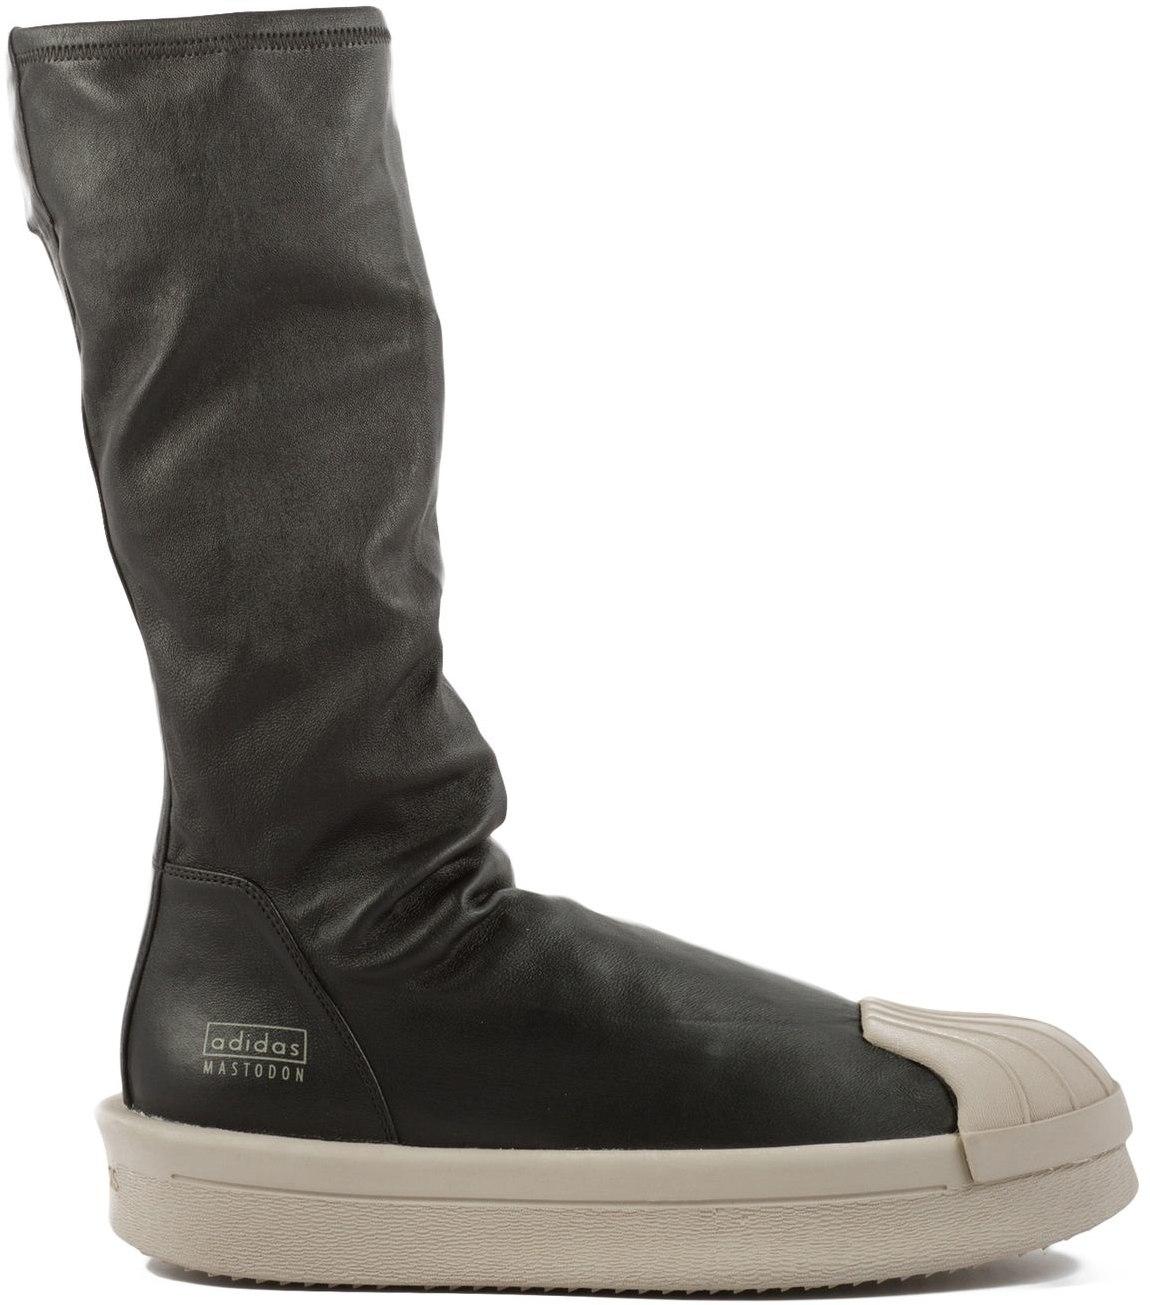 SHOP Unisex - ADIDAS by RICK OWENS: RO Mastodon Stretch Boots - Black -  Footwear, Sneakers | INFLUENCE U